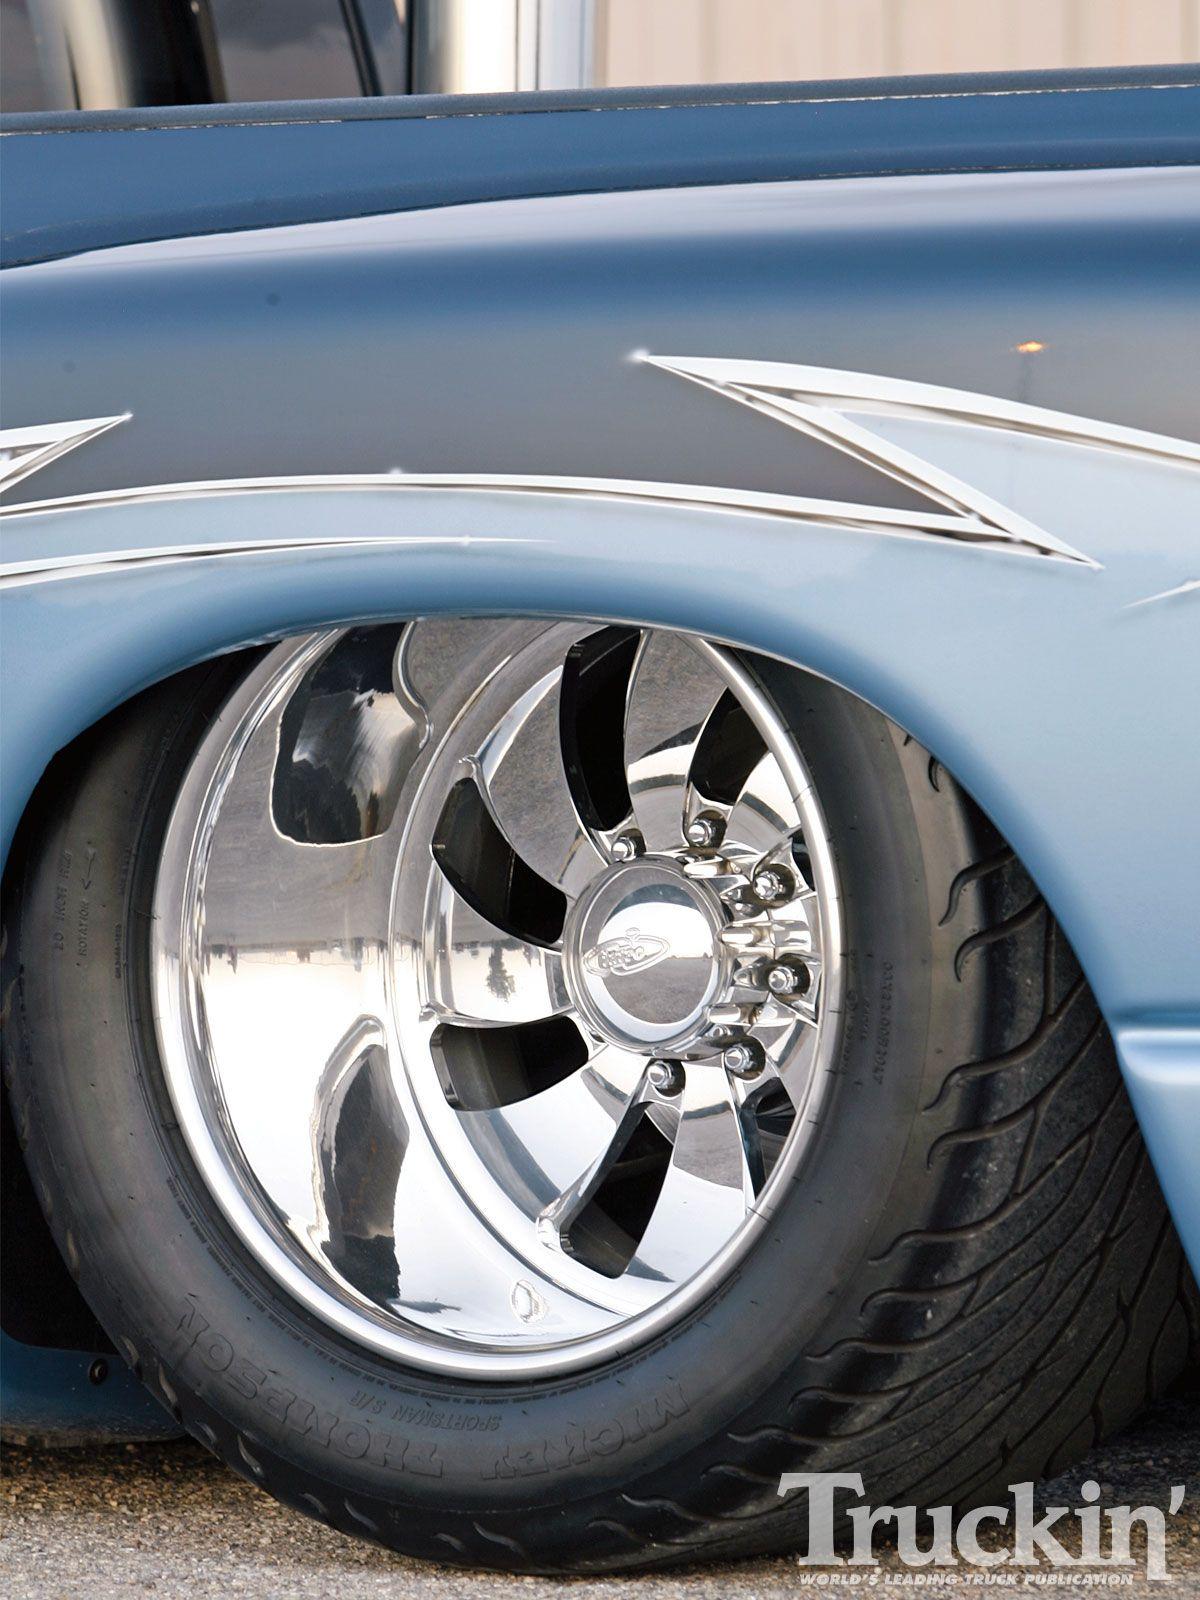 rims got ram forum wheels my forums friday viper srt dodge back